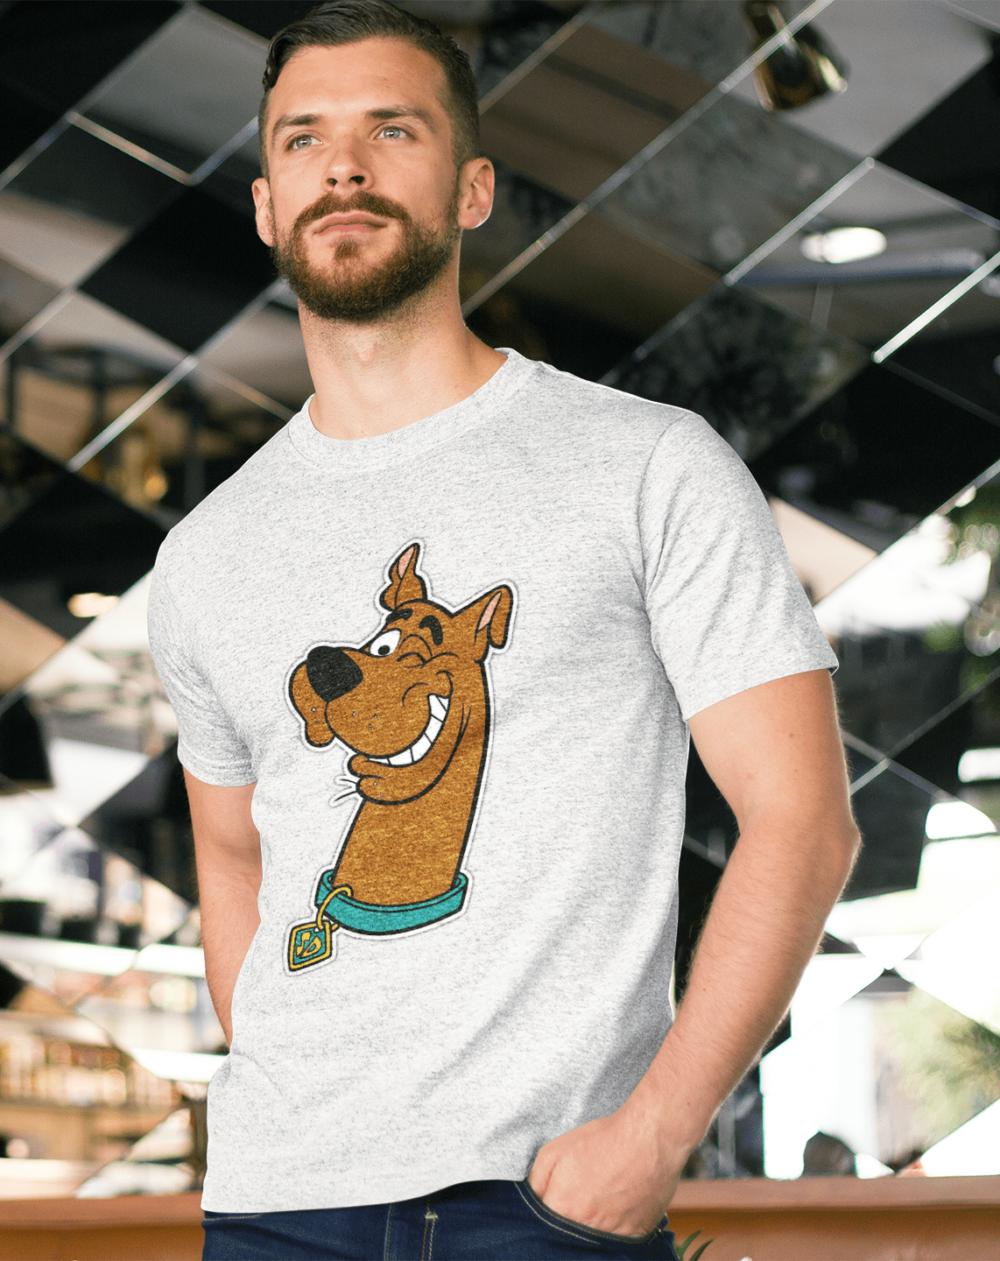 Scooby Doo white Melange T-shirt